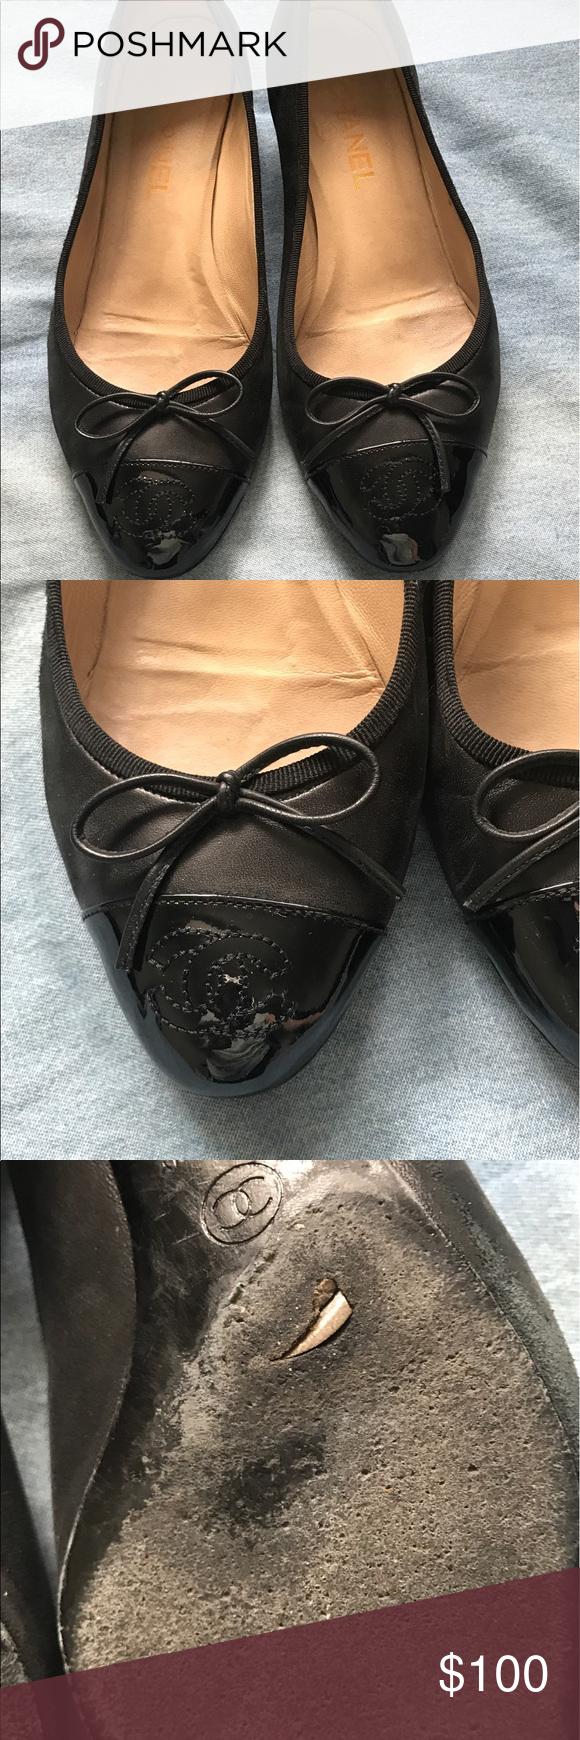 b40a6c8061fb Chanel women black shoes size 40 Chanel beautiful shoe the bottom of the  shoe has a